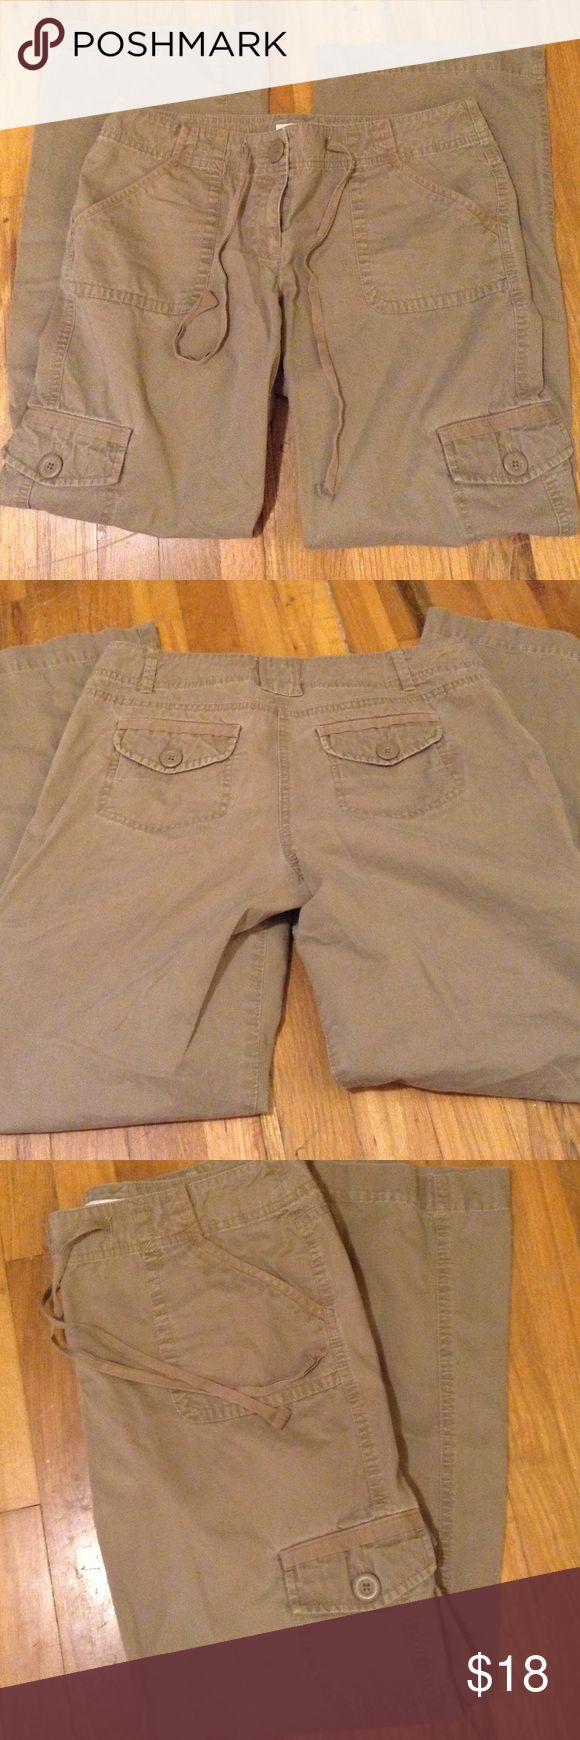 Khaki cargo pants Great condition khaki cargos with leg pockets and string tie. LOFT Pants Wide Leg